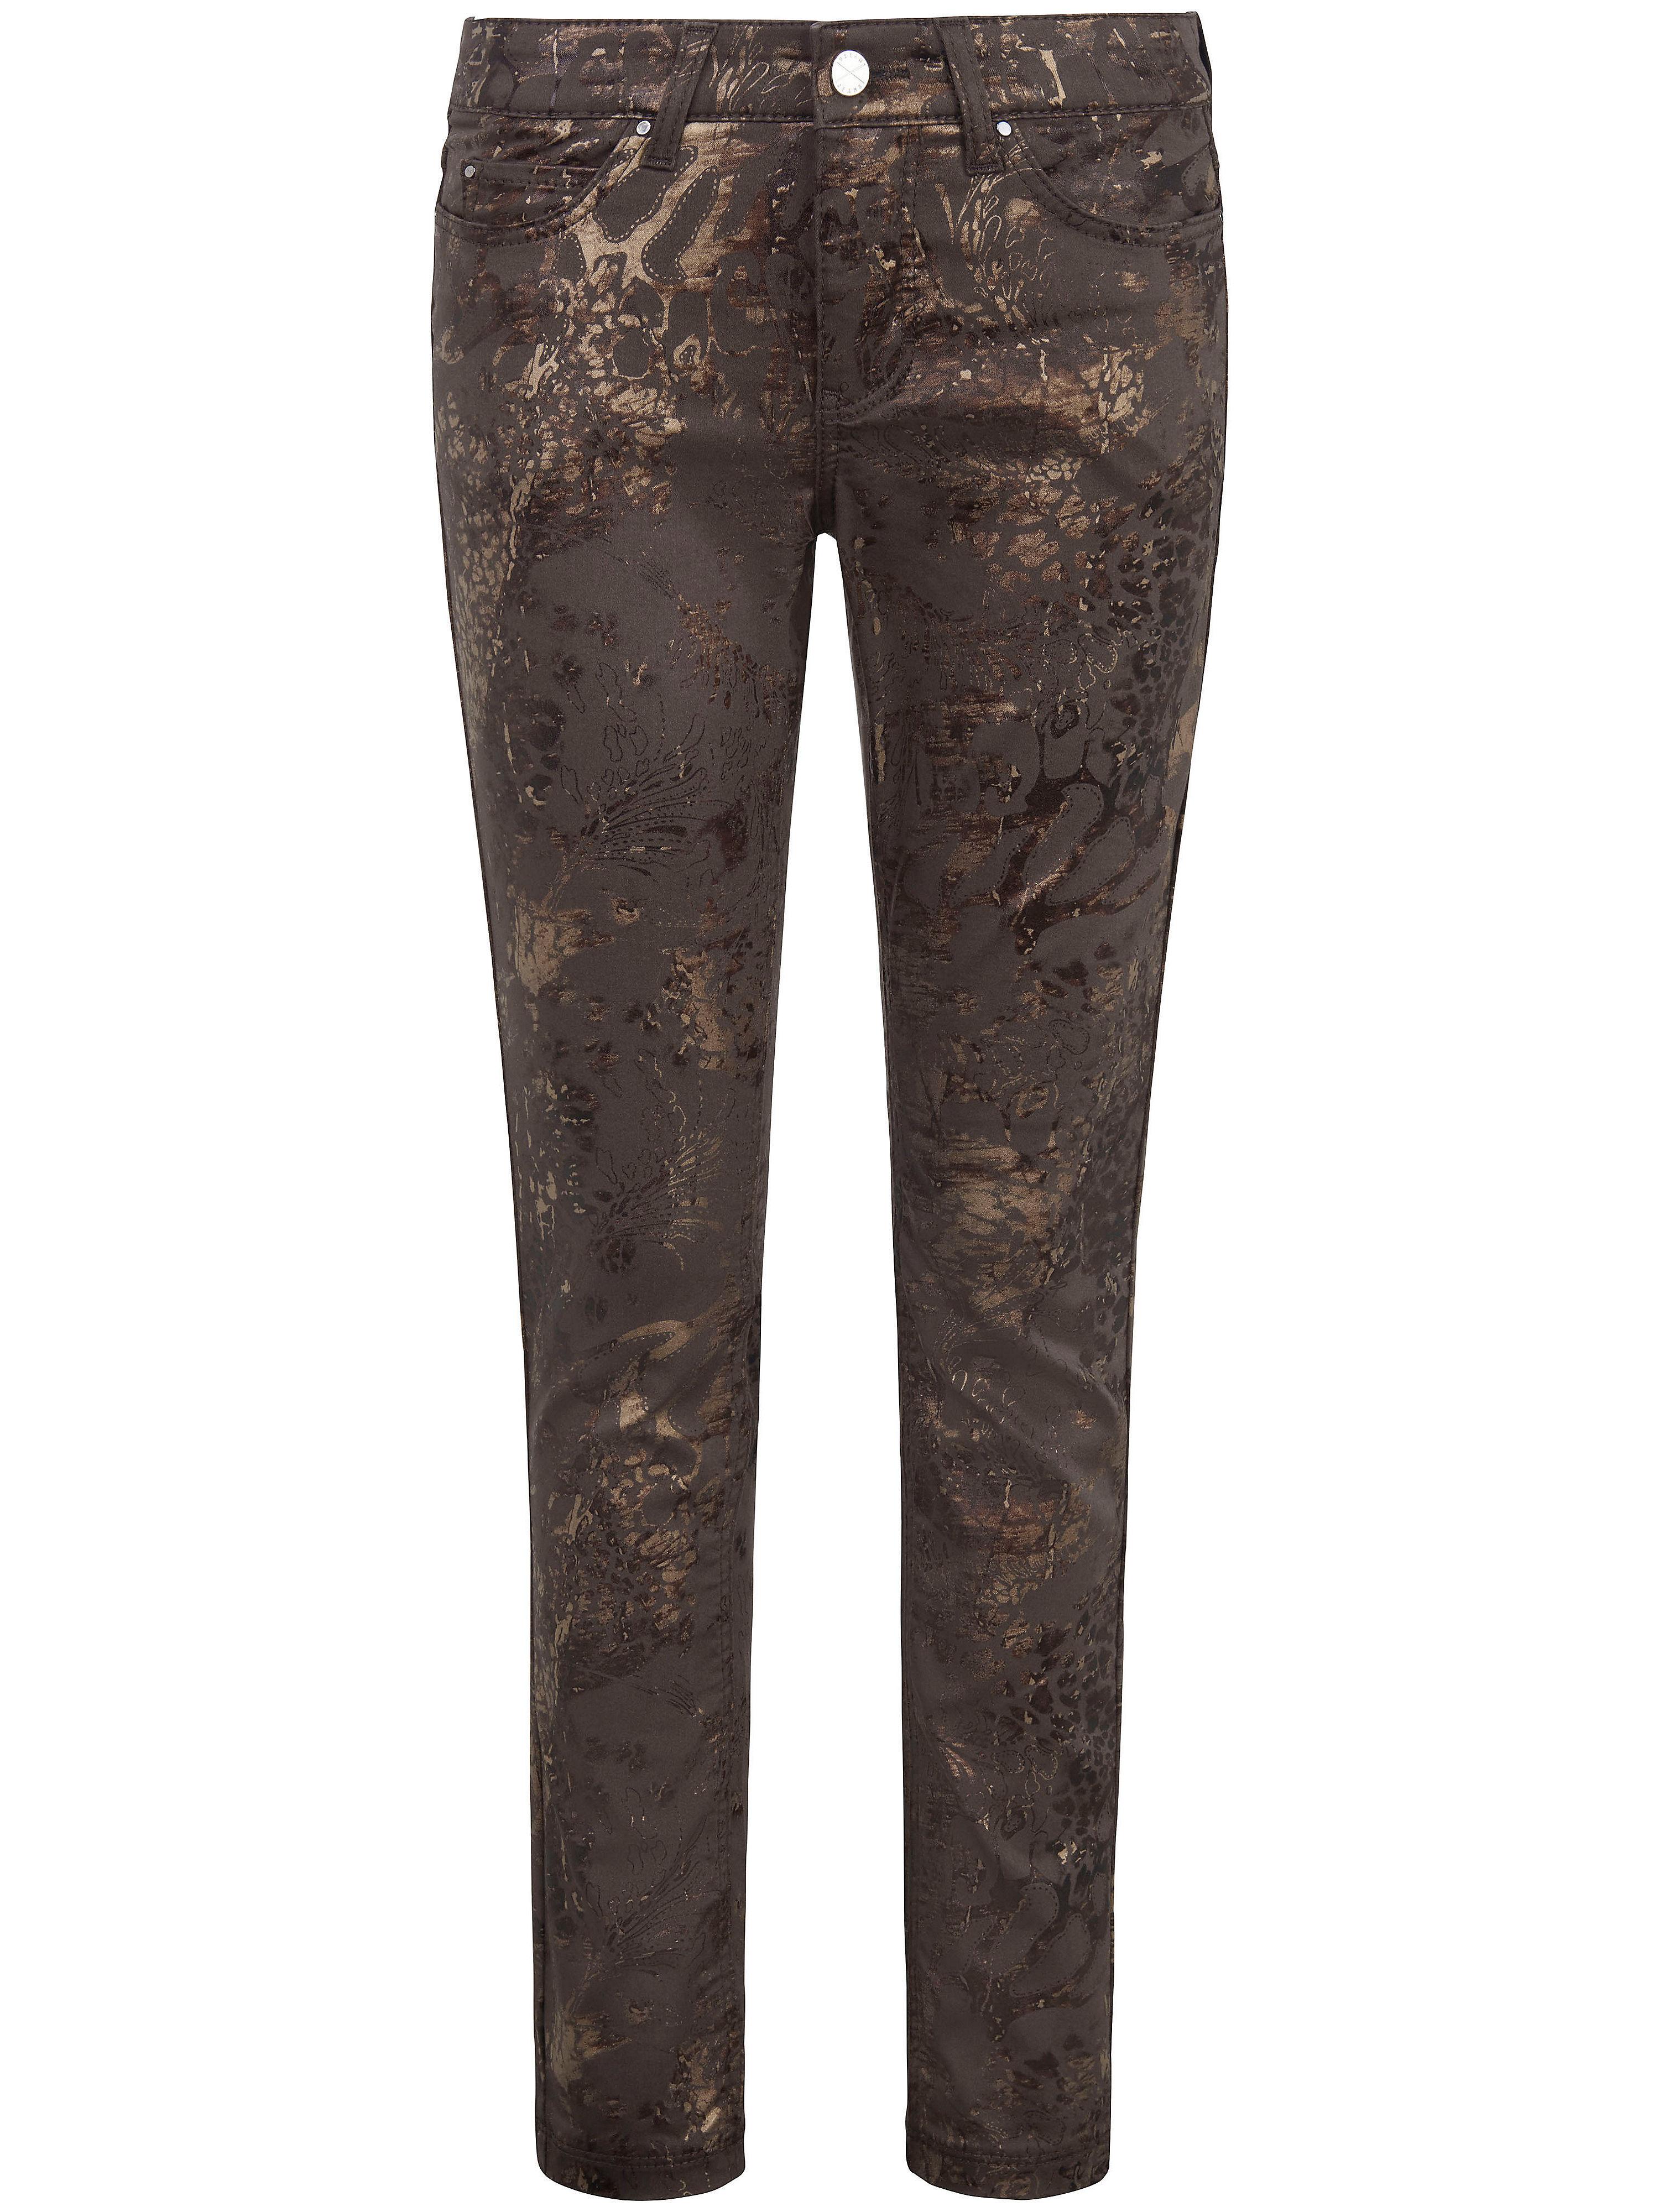 Mac Jeans Dream Skinny, tumlängs 28 inches från Mac brun